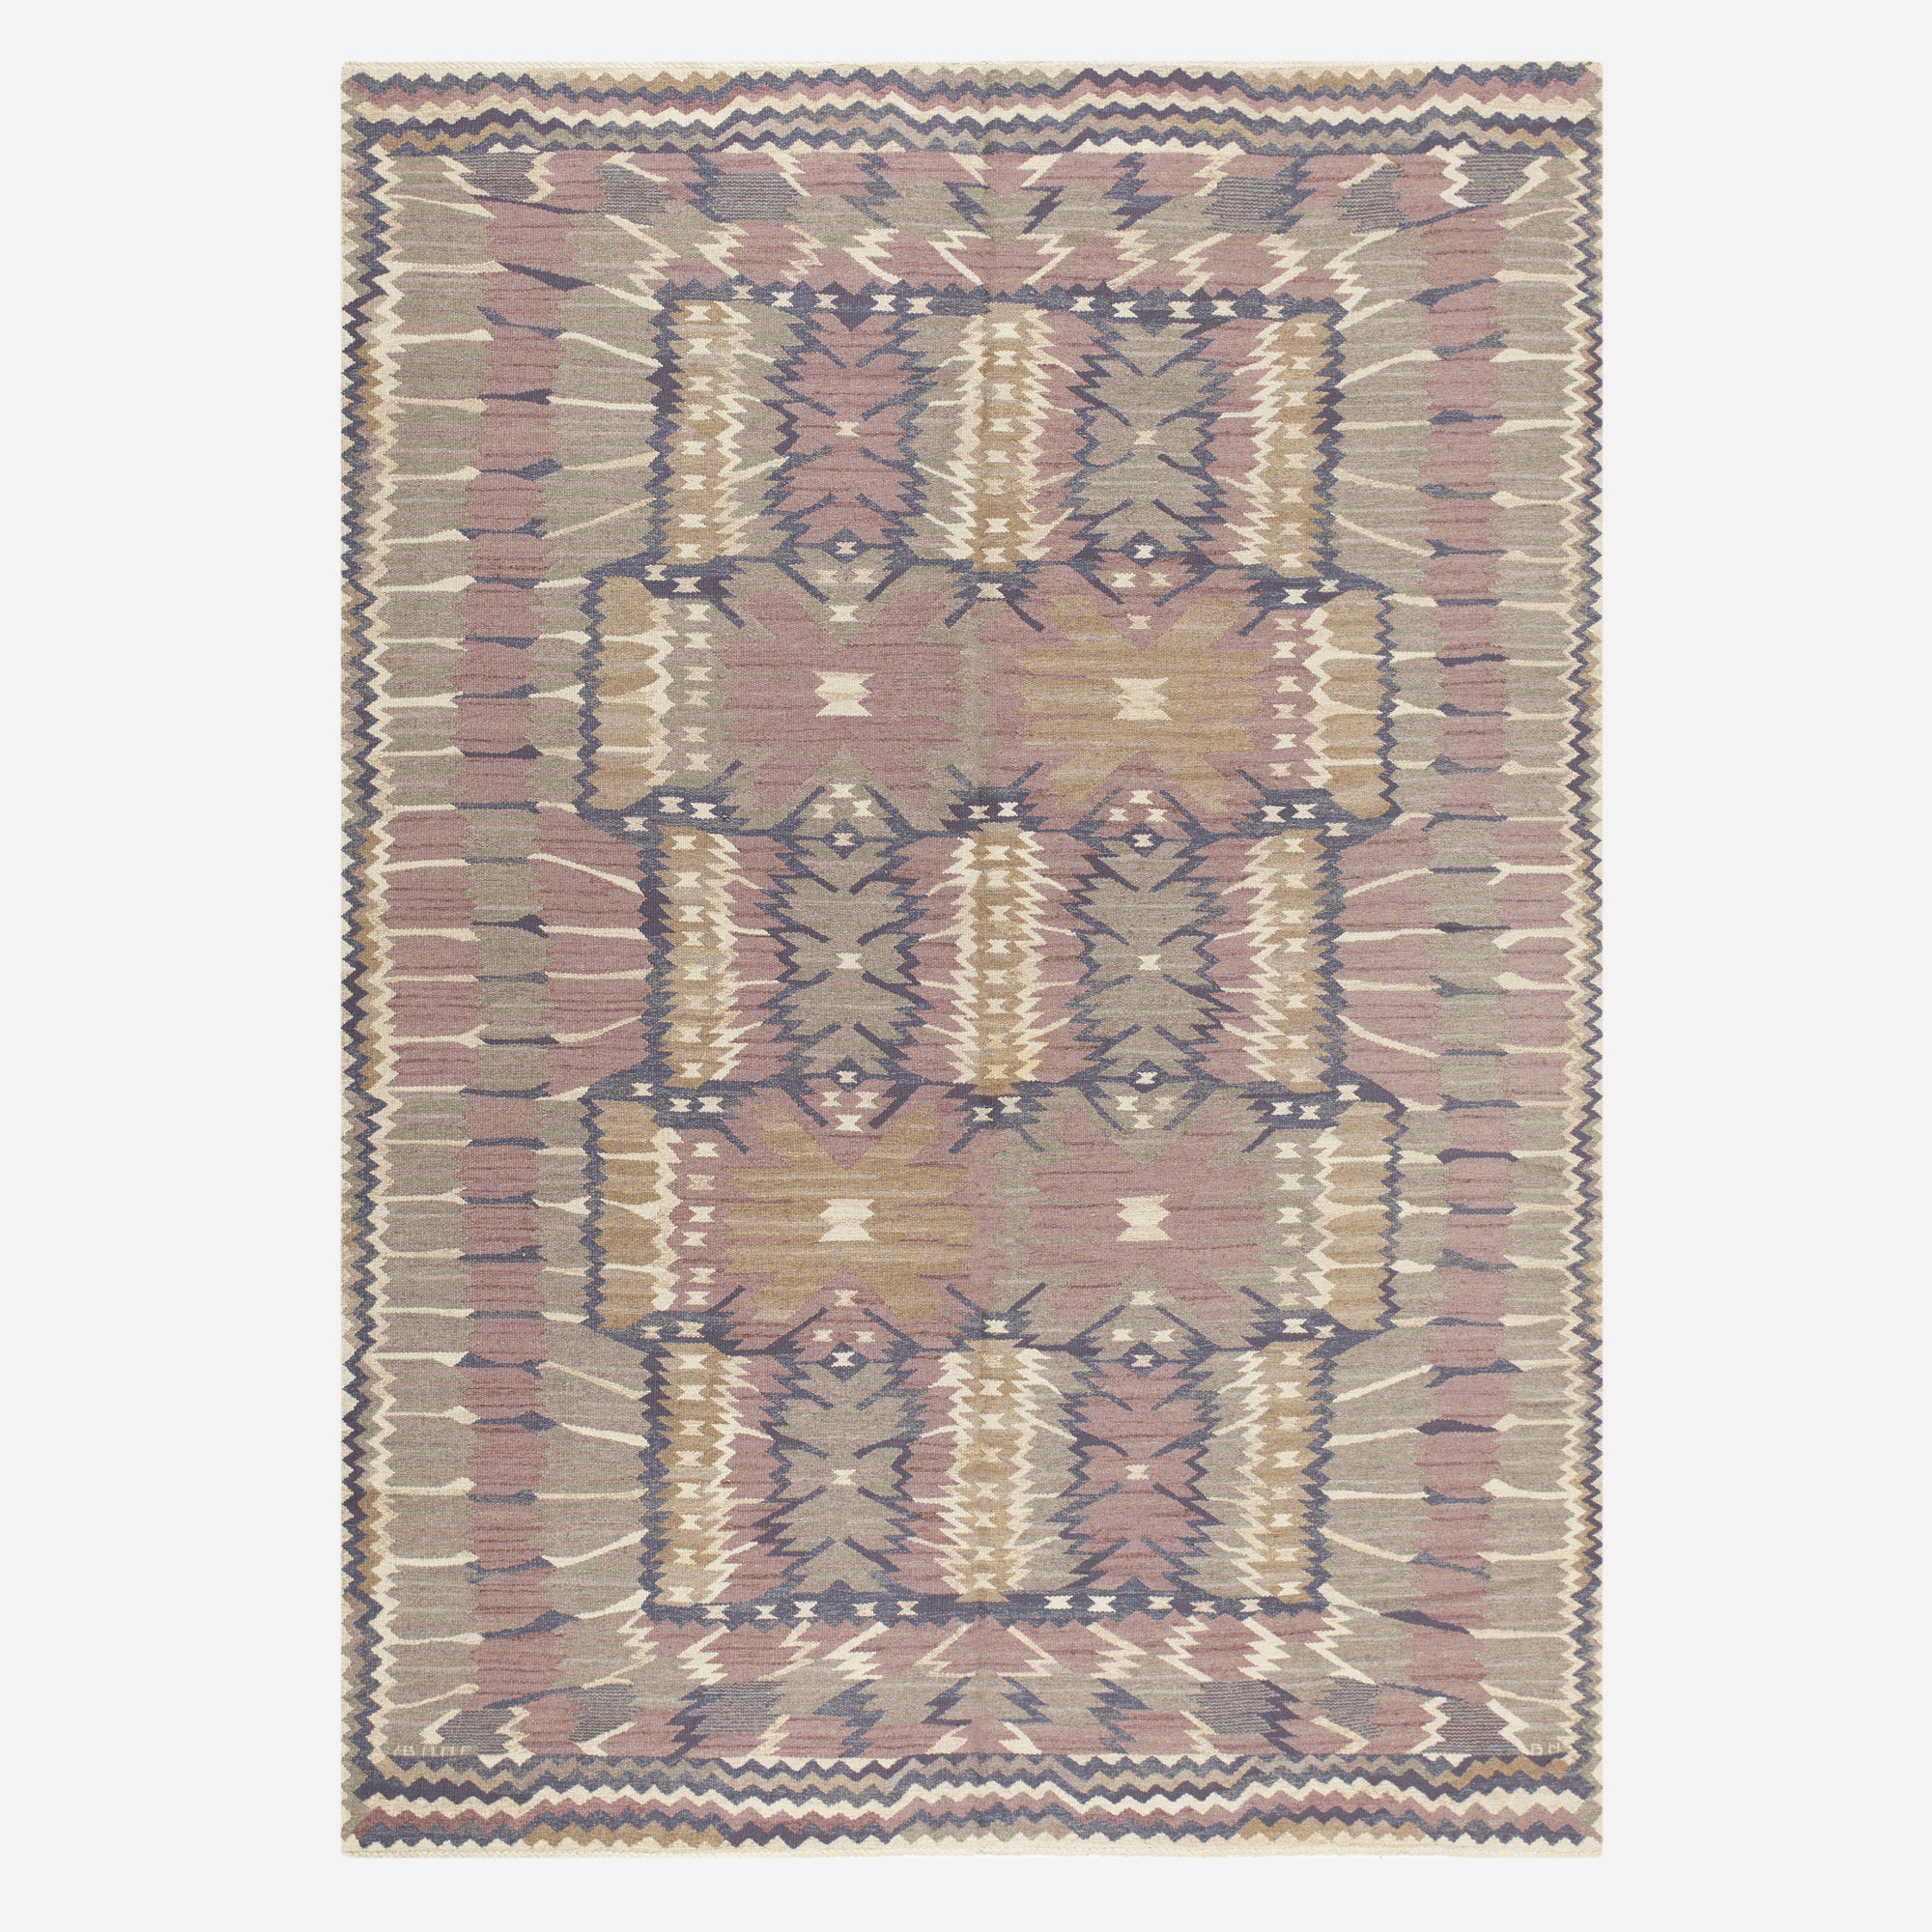 139: Barbro Nilsson / Strålblomman tapestry weave carpet (1 of 2)